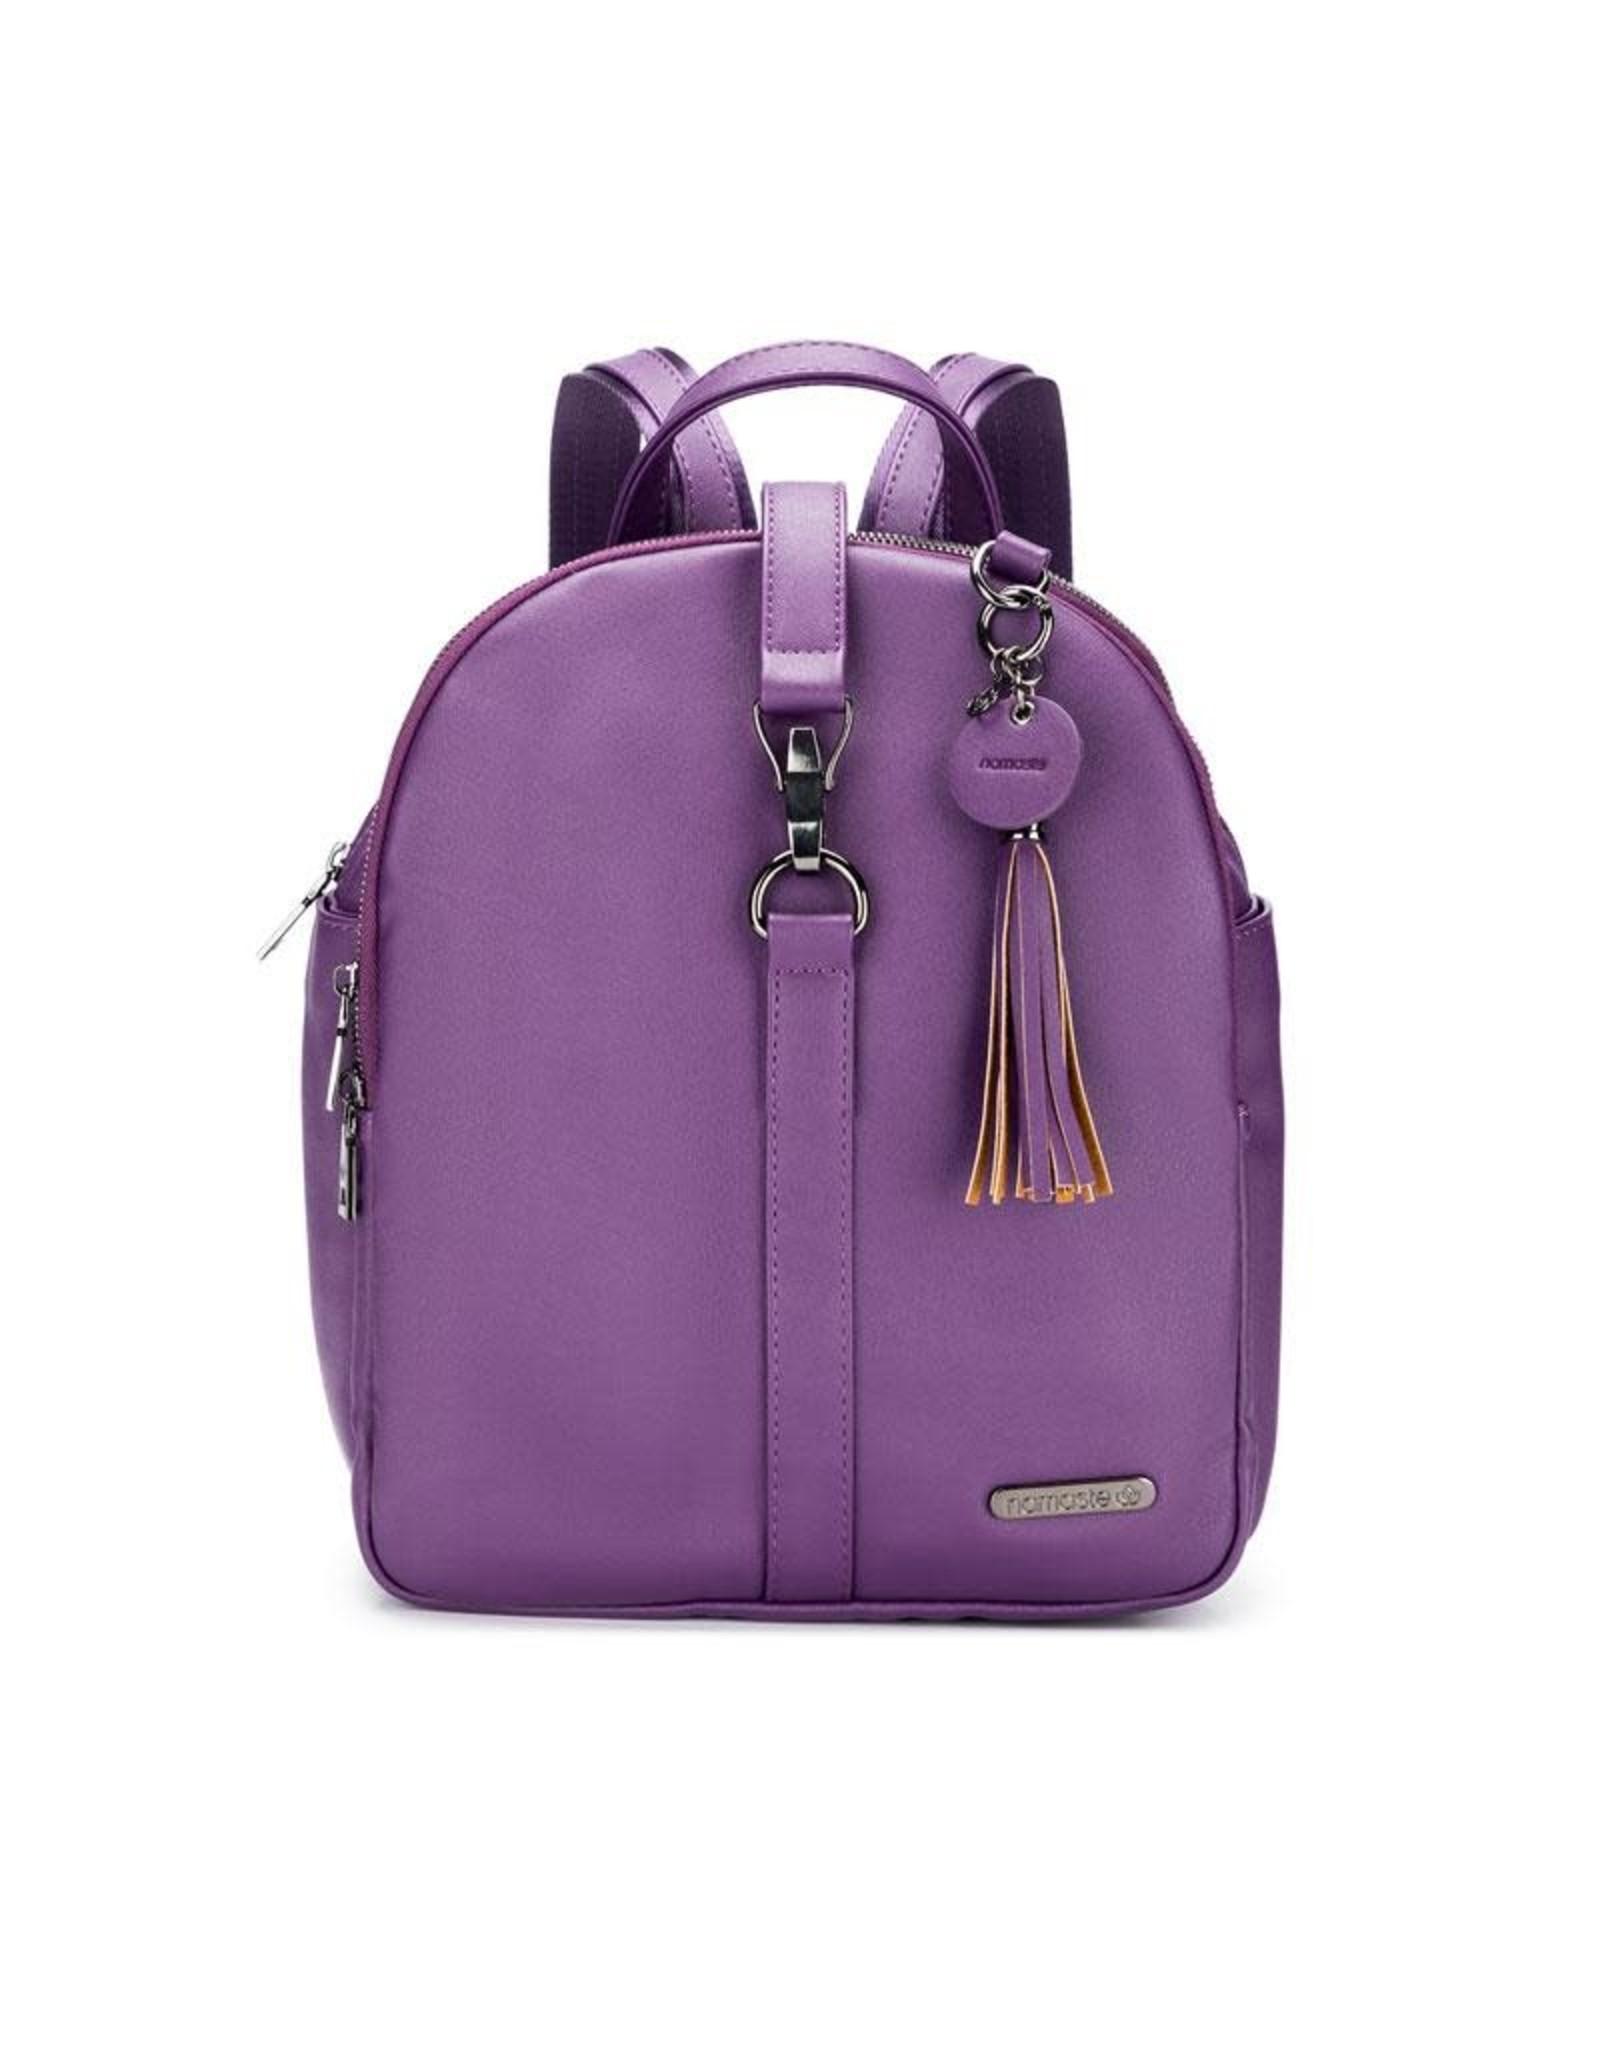 Namaste Maker's Mini Backpack Purple